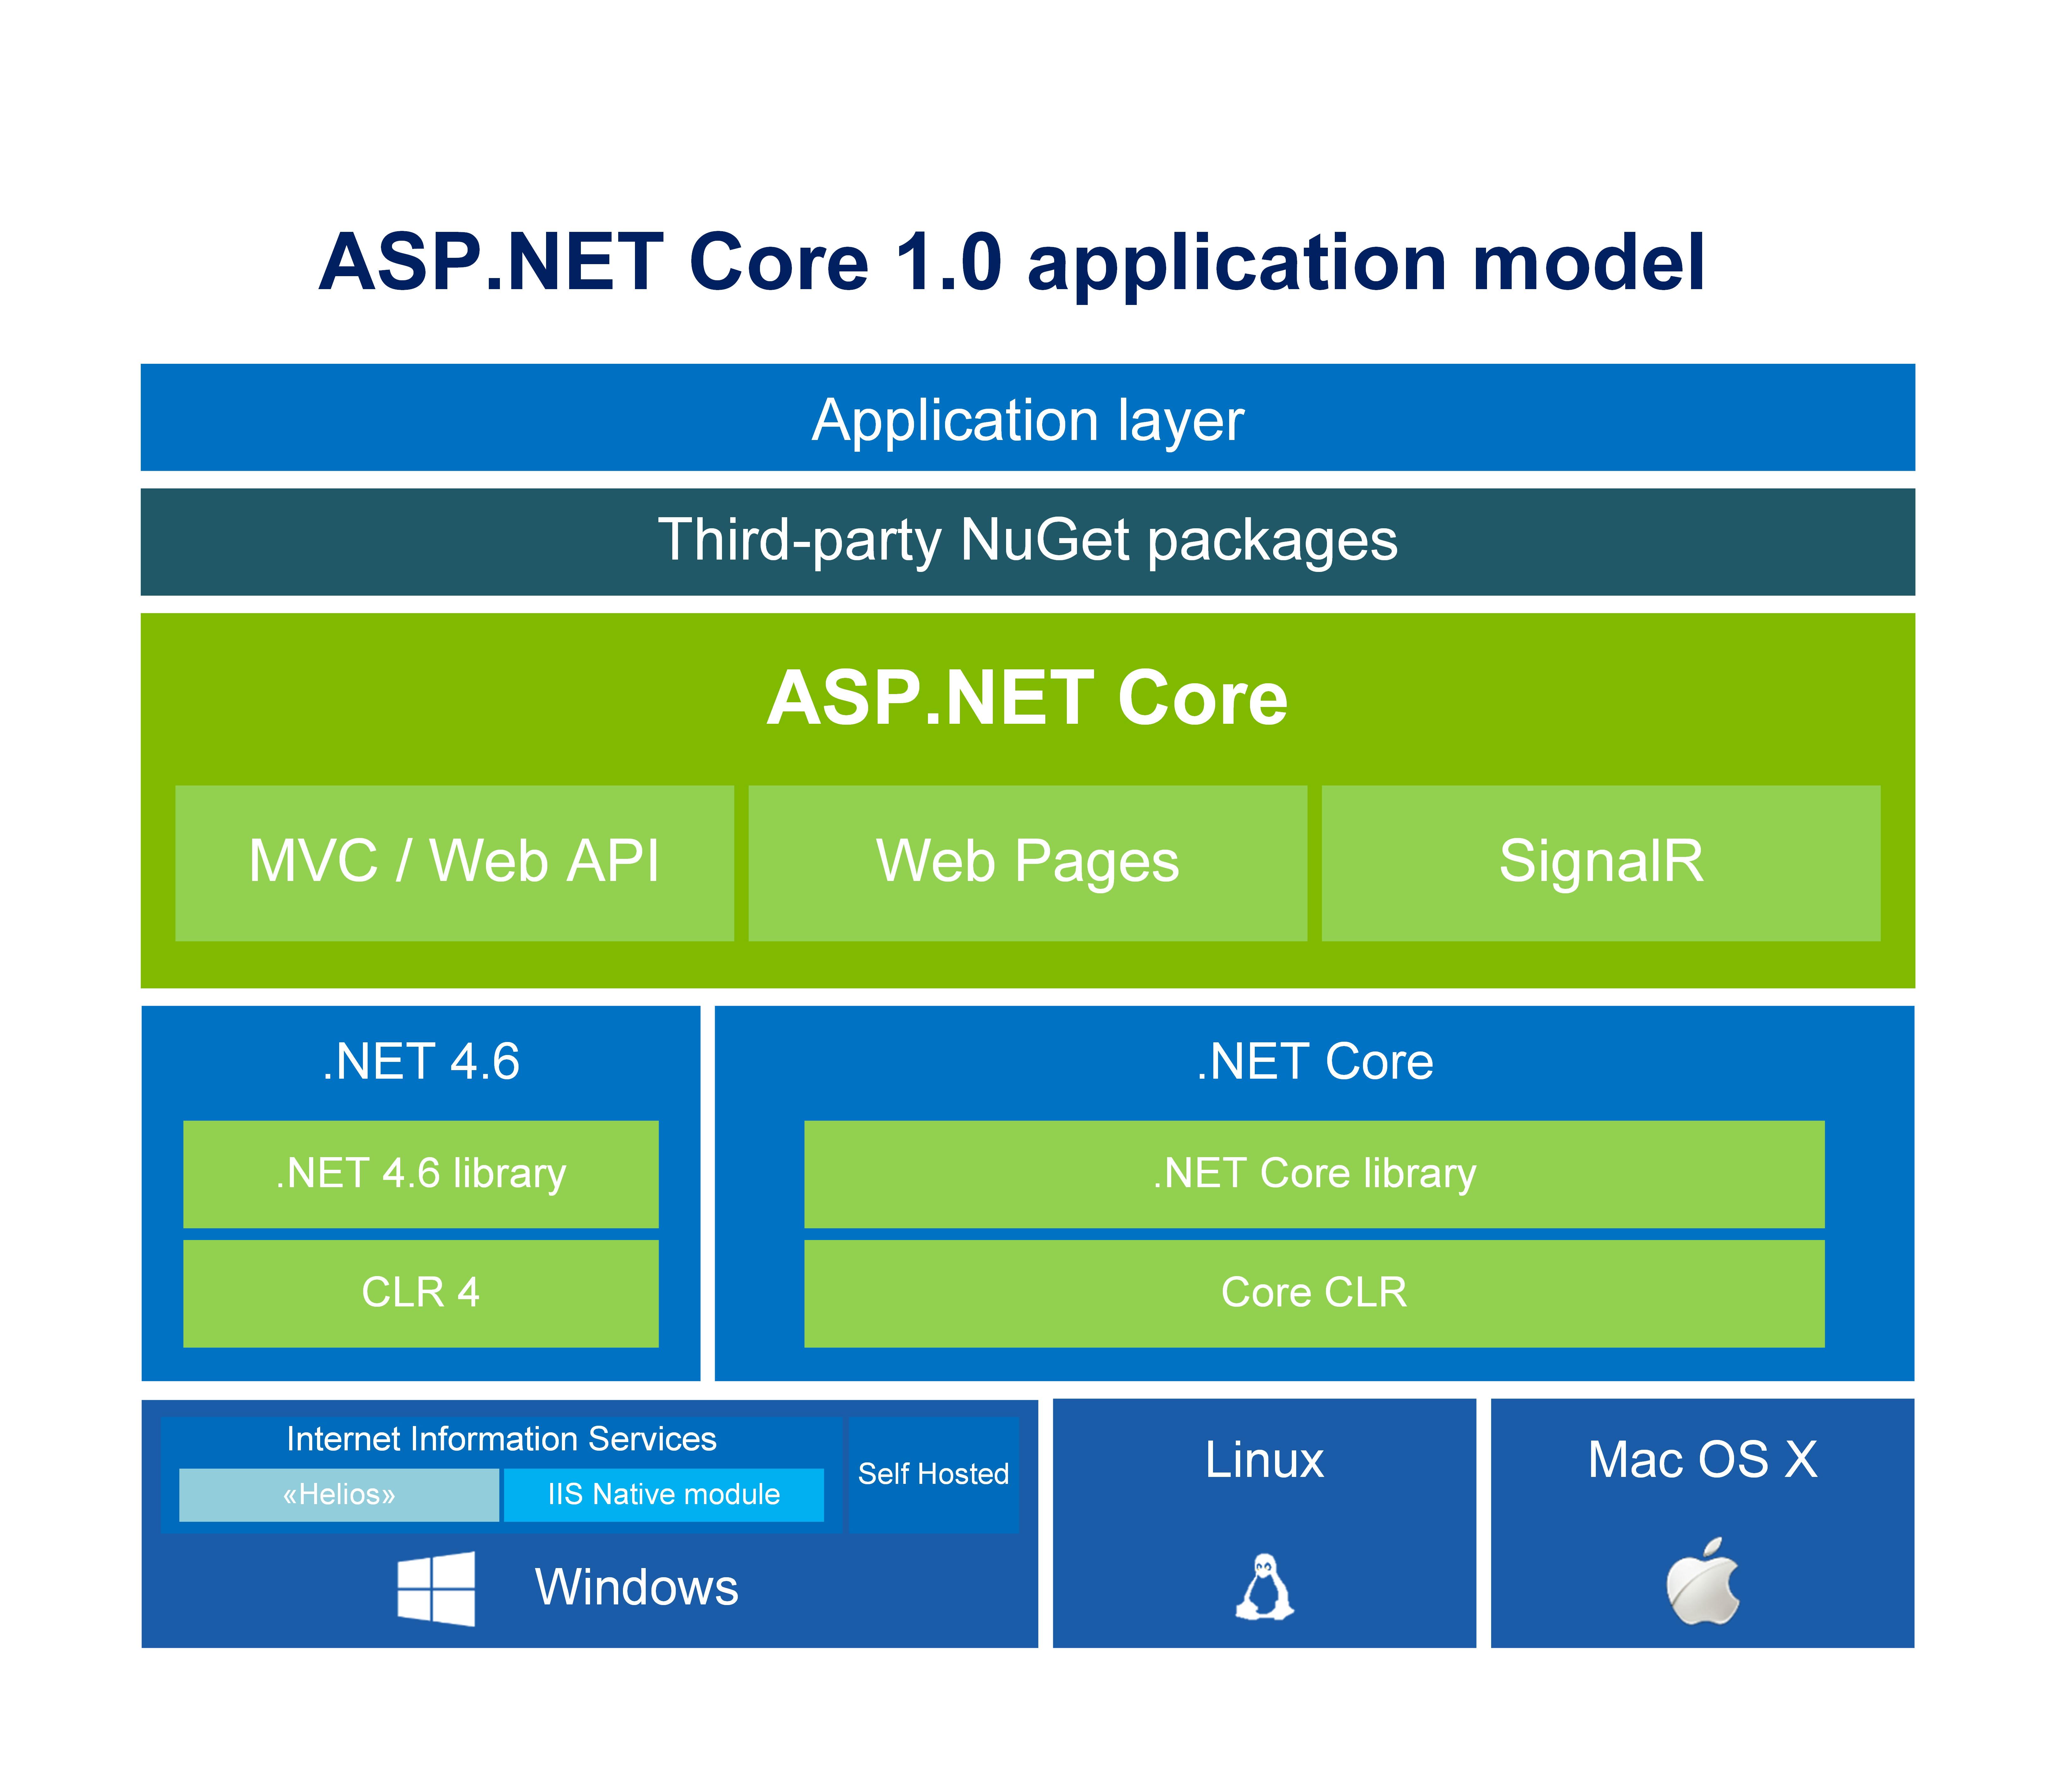 ASP.NET Core 1.0 application model